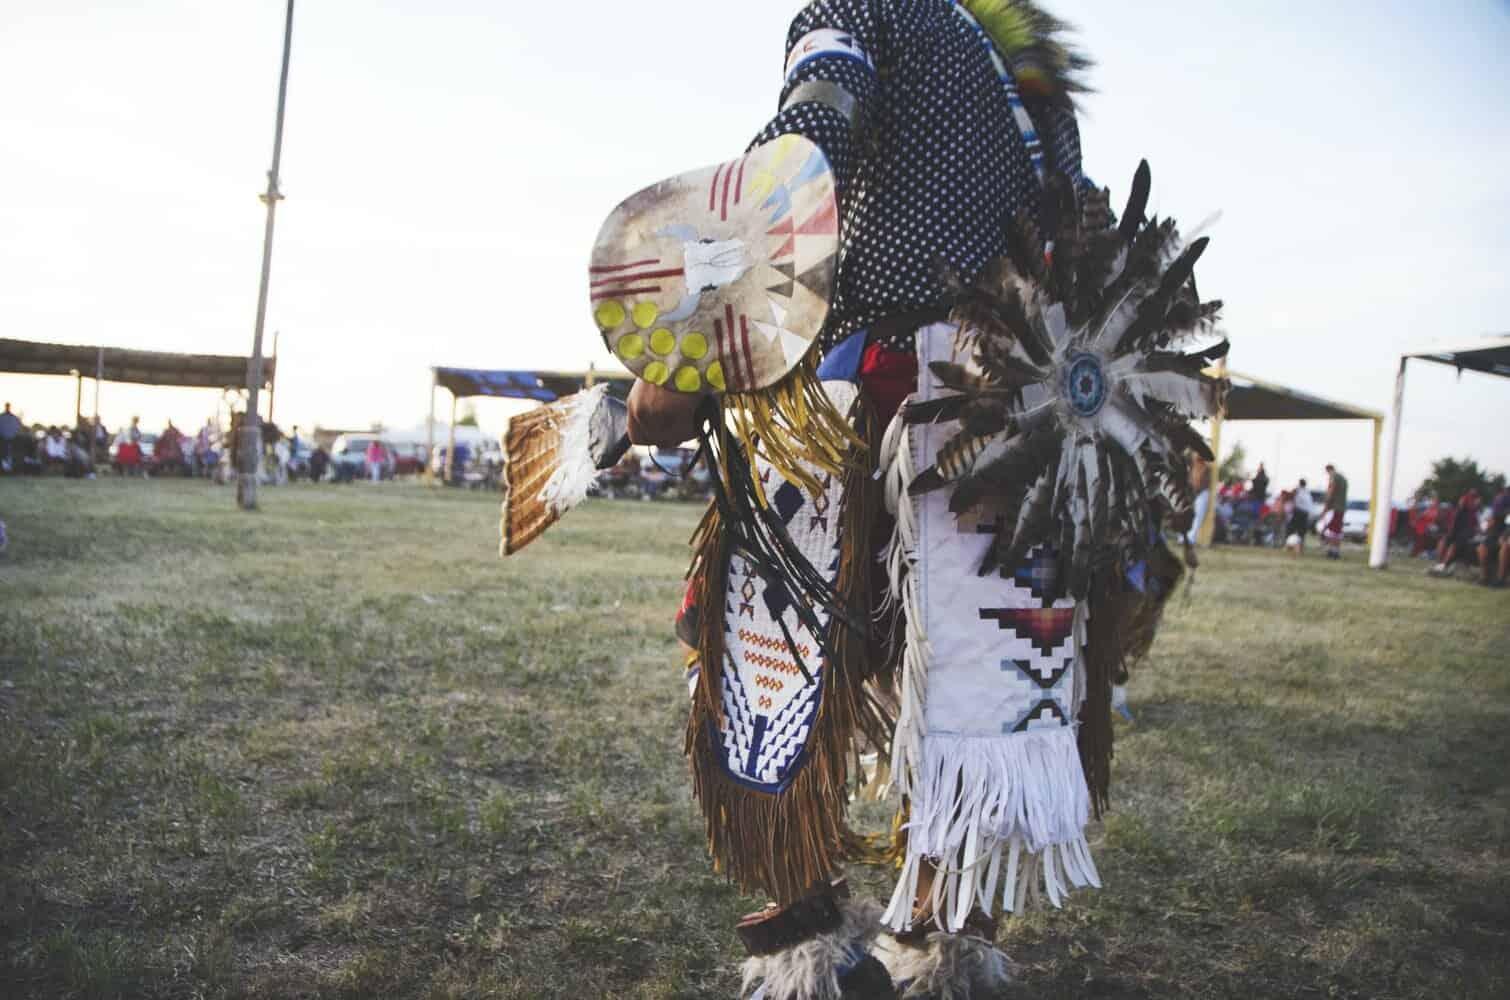 Indigenous Leaders in the US: Activist Spotlight on Vine Deloria Jr.